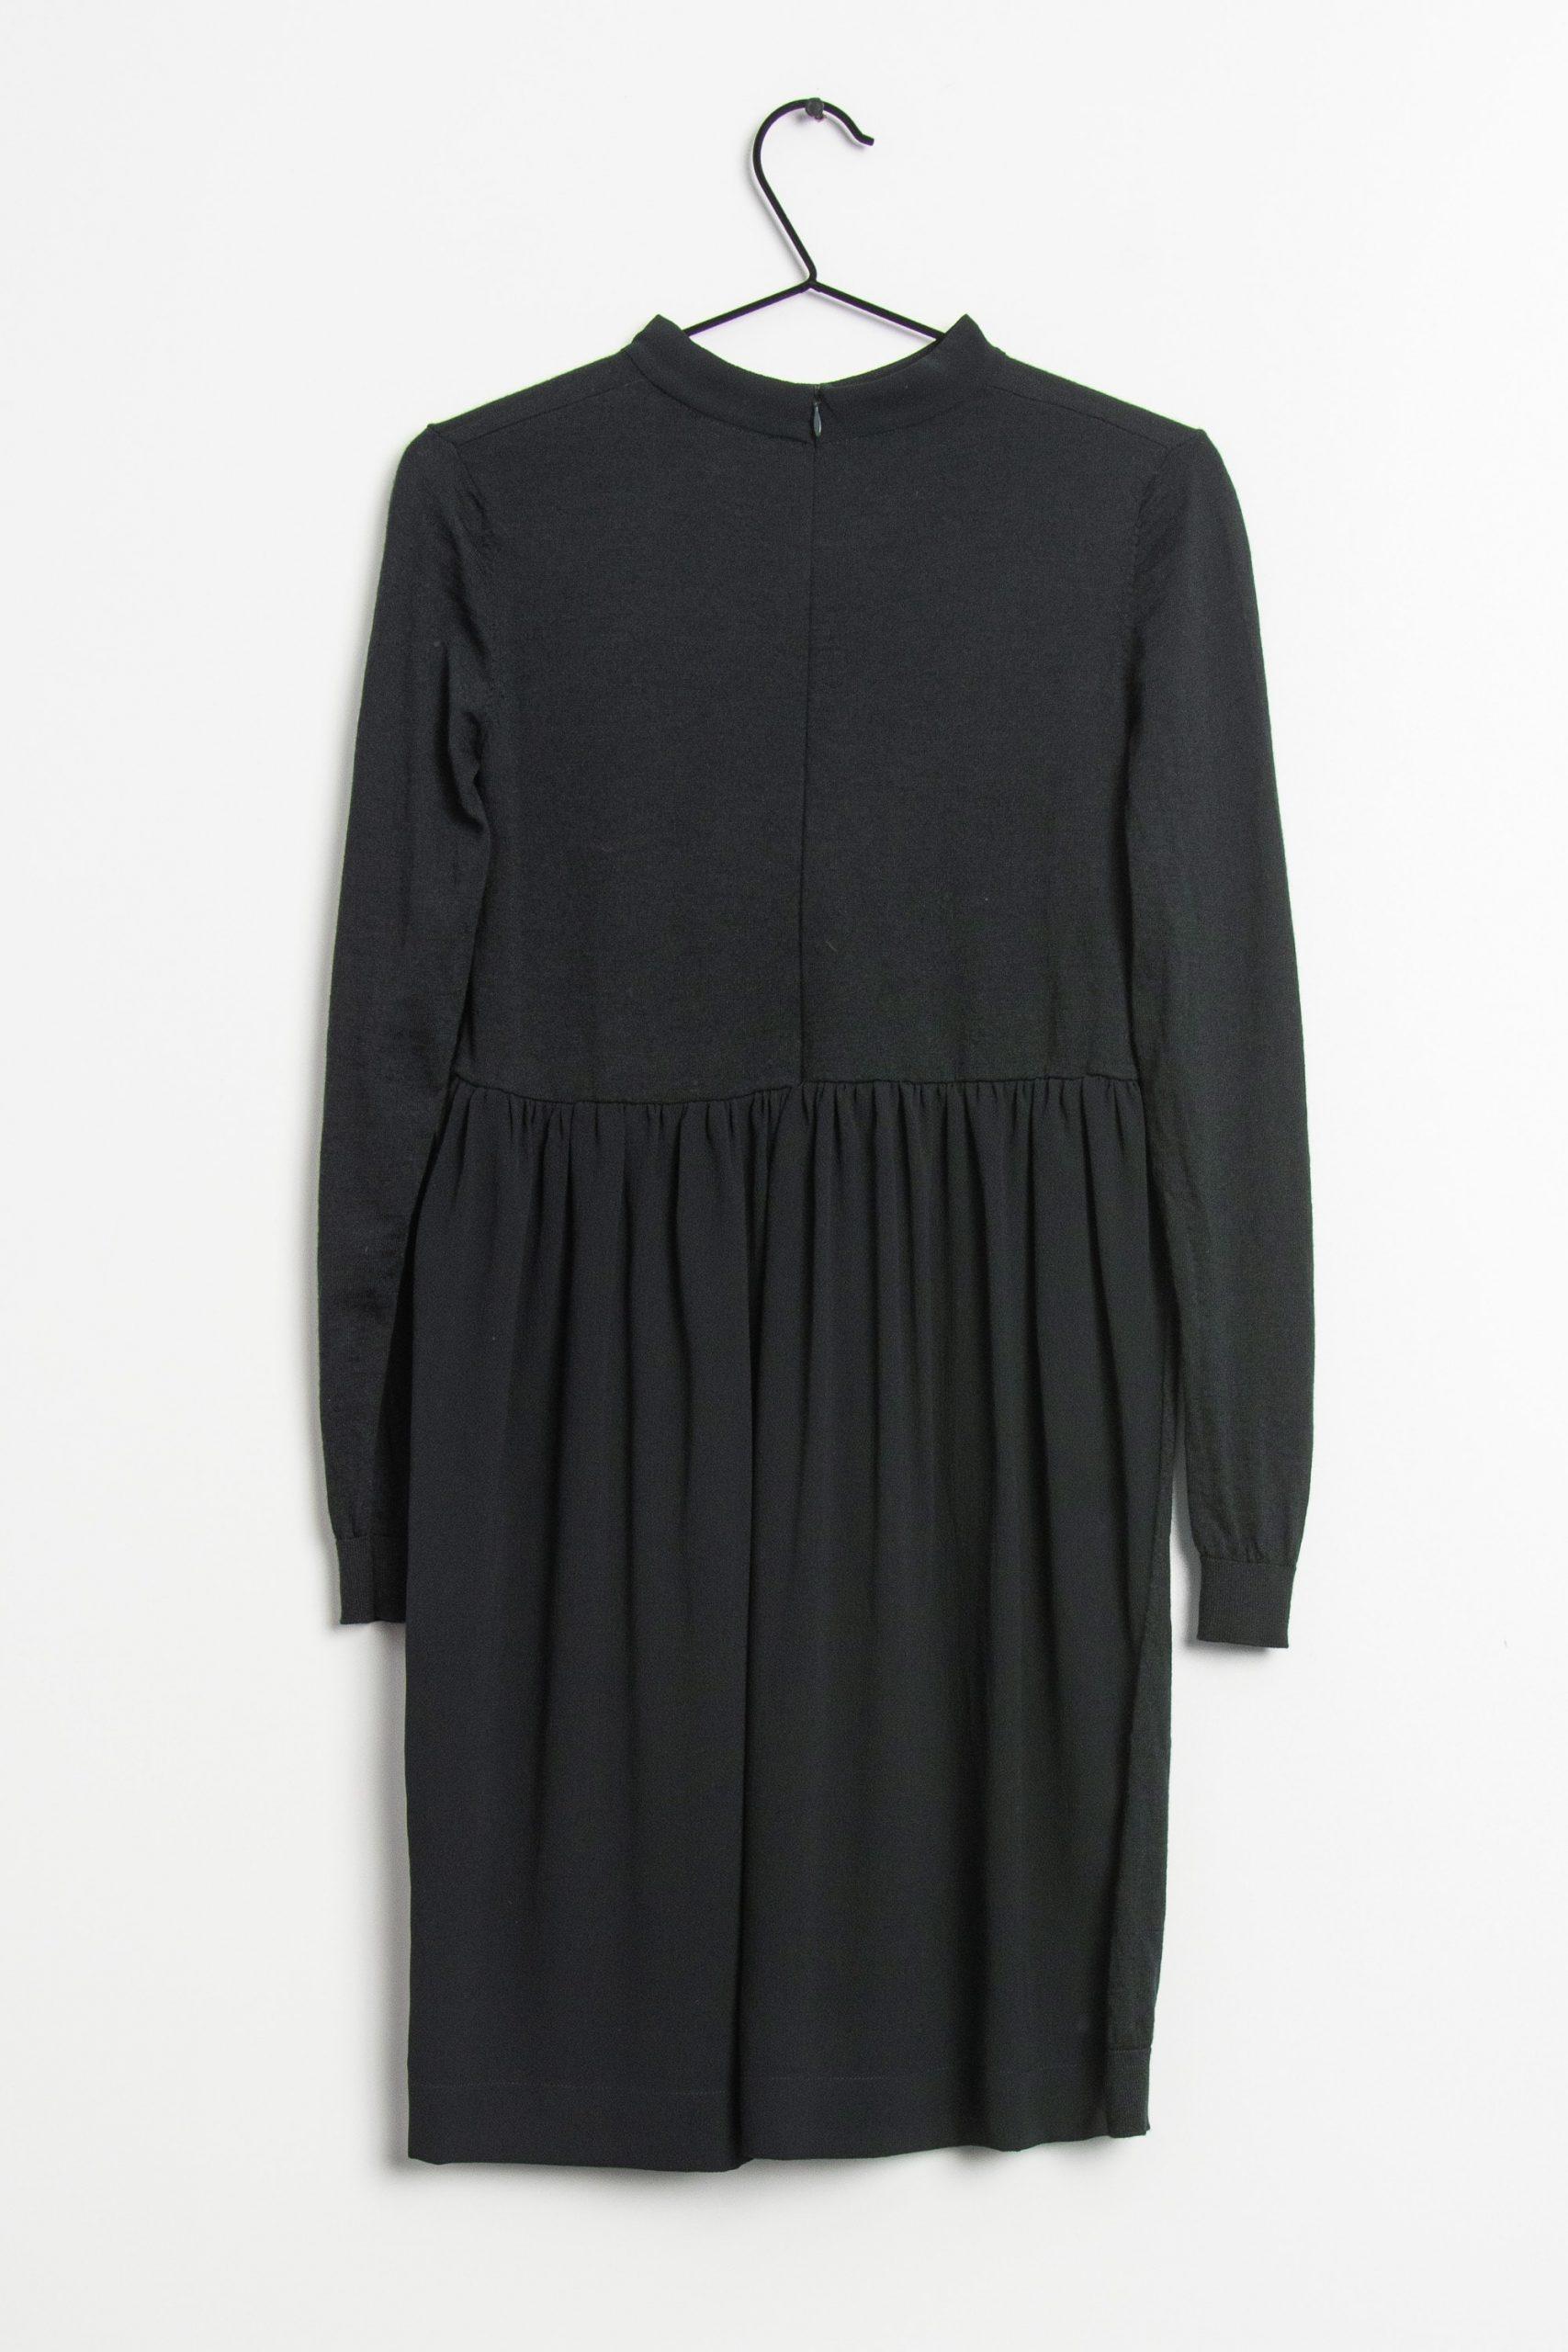 Cos Kleid Schwarz Grxs